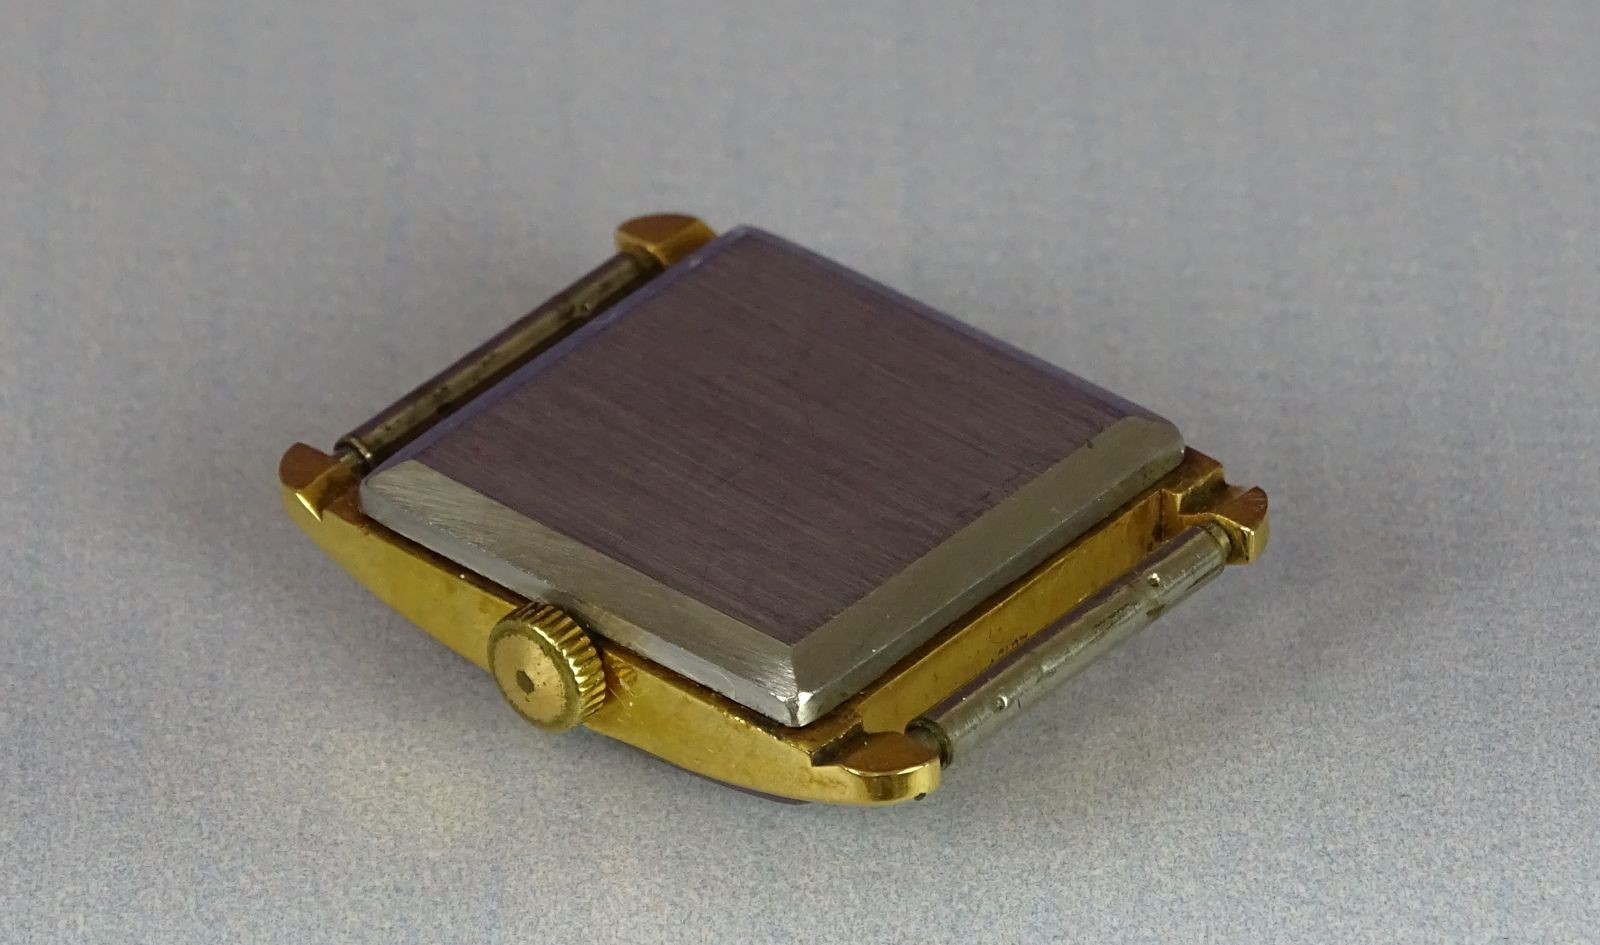 DSC06677.JPG (1600�945)